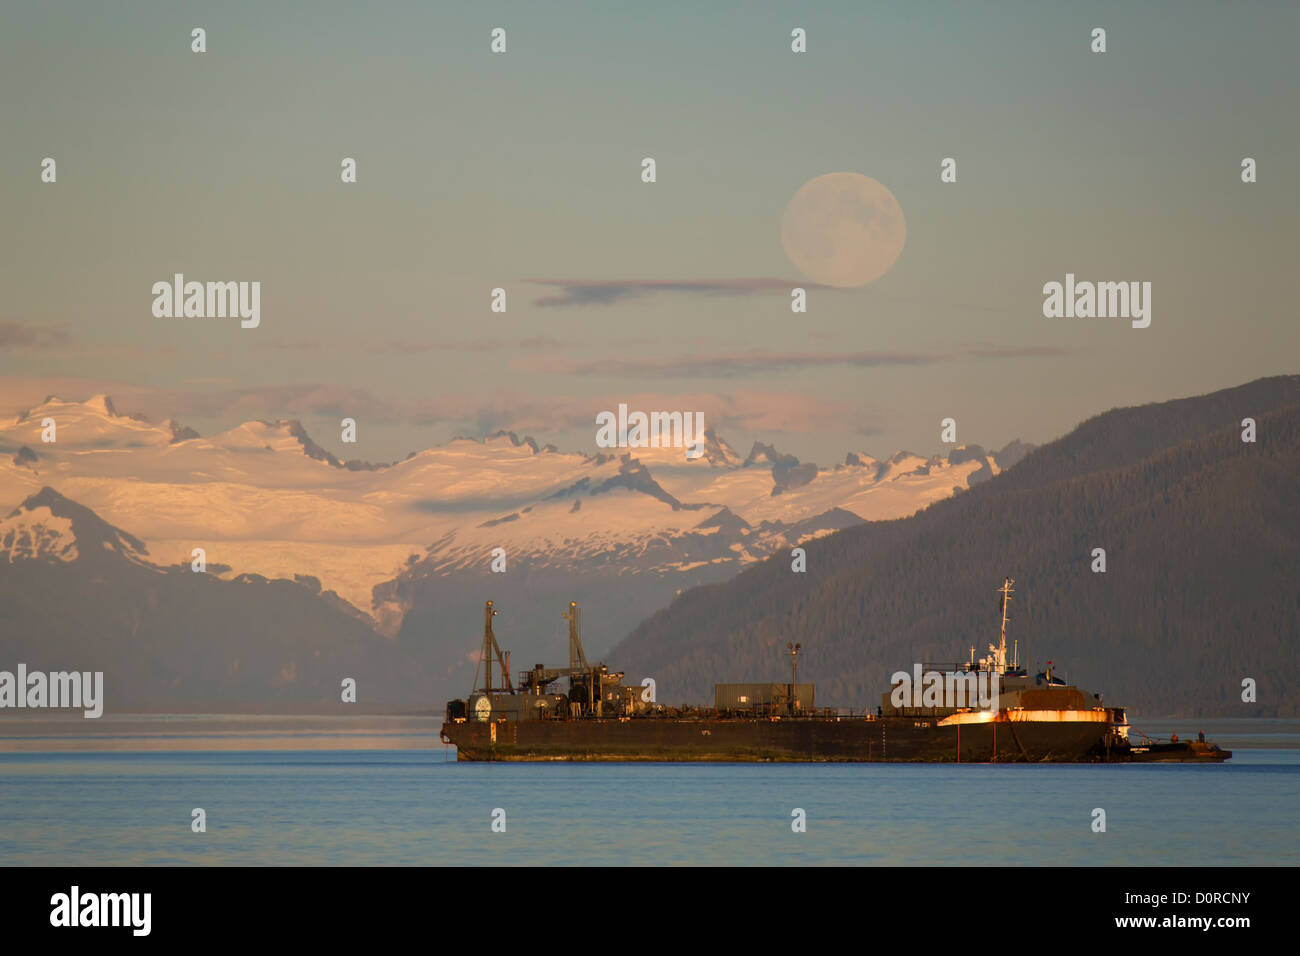 Petro Marine Services barge, Tongass National Forest, Alaska. - Stock Image